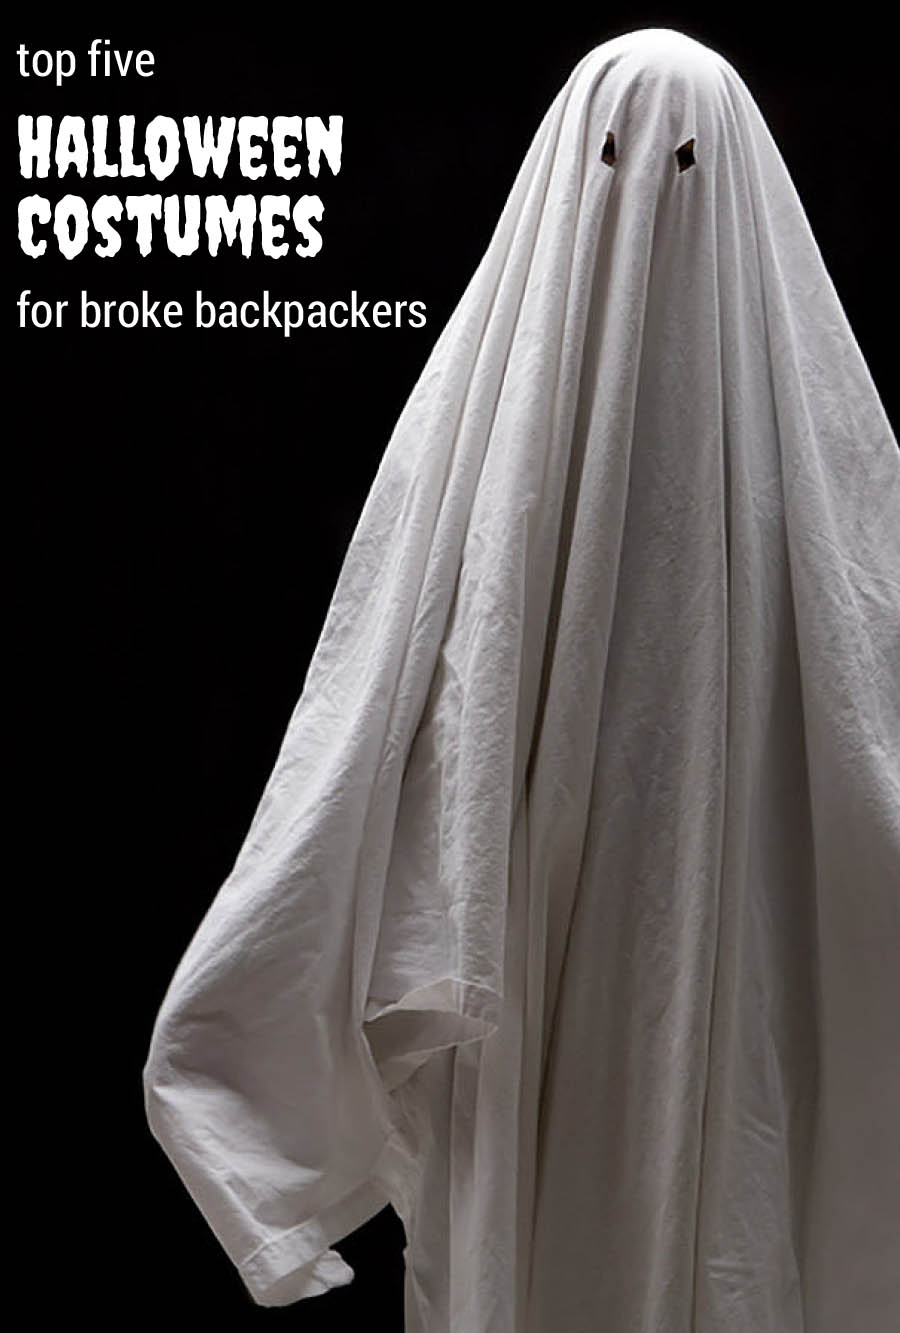 Five Halloween Costumes for Broke Backpackers